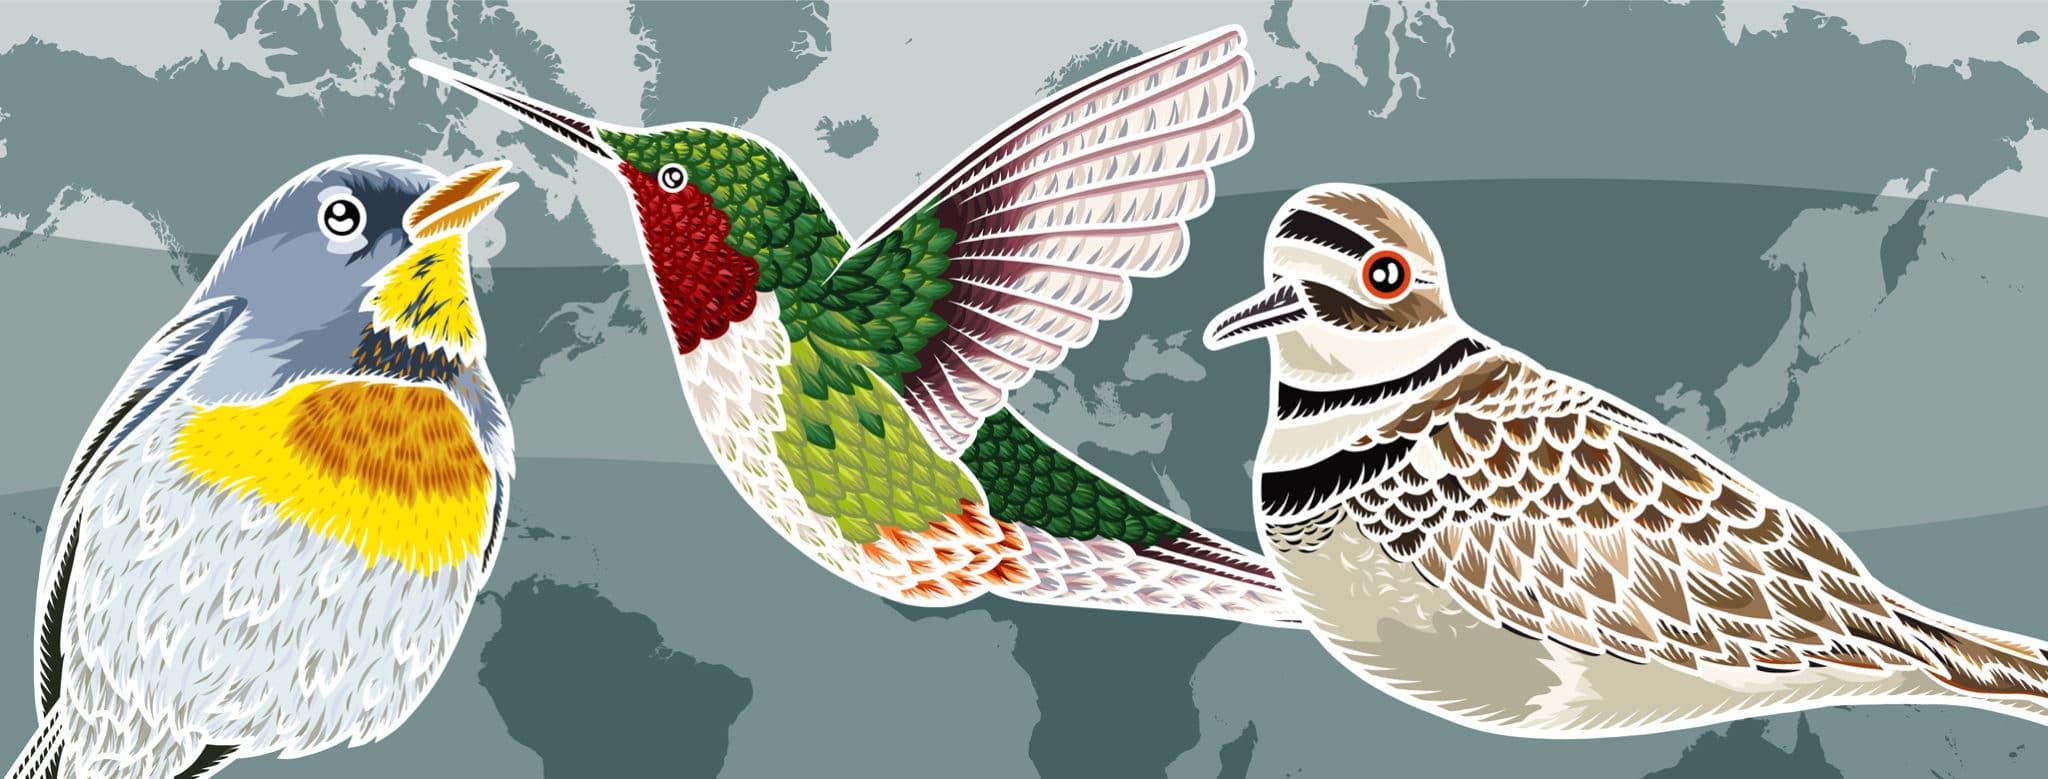 Three cartoon birds among a background of the world map